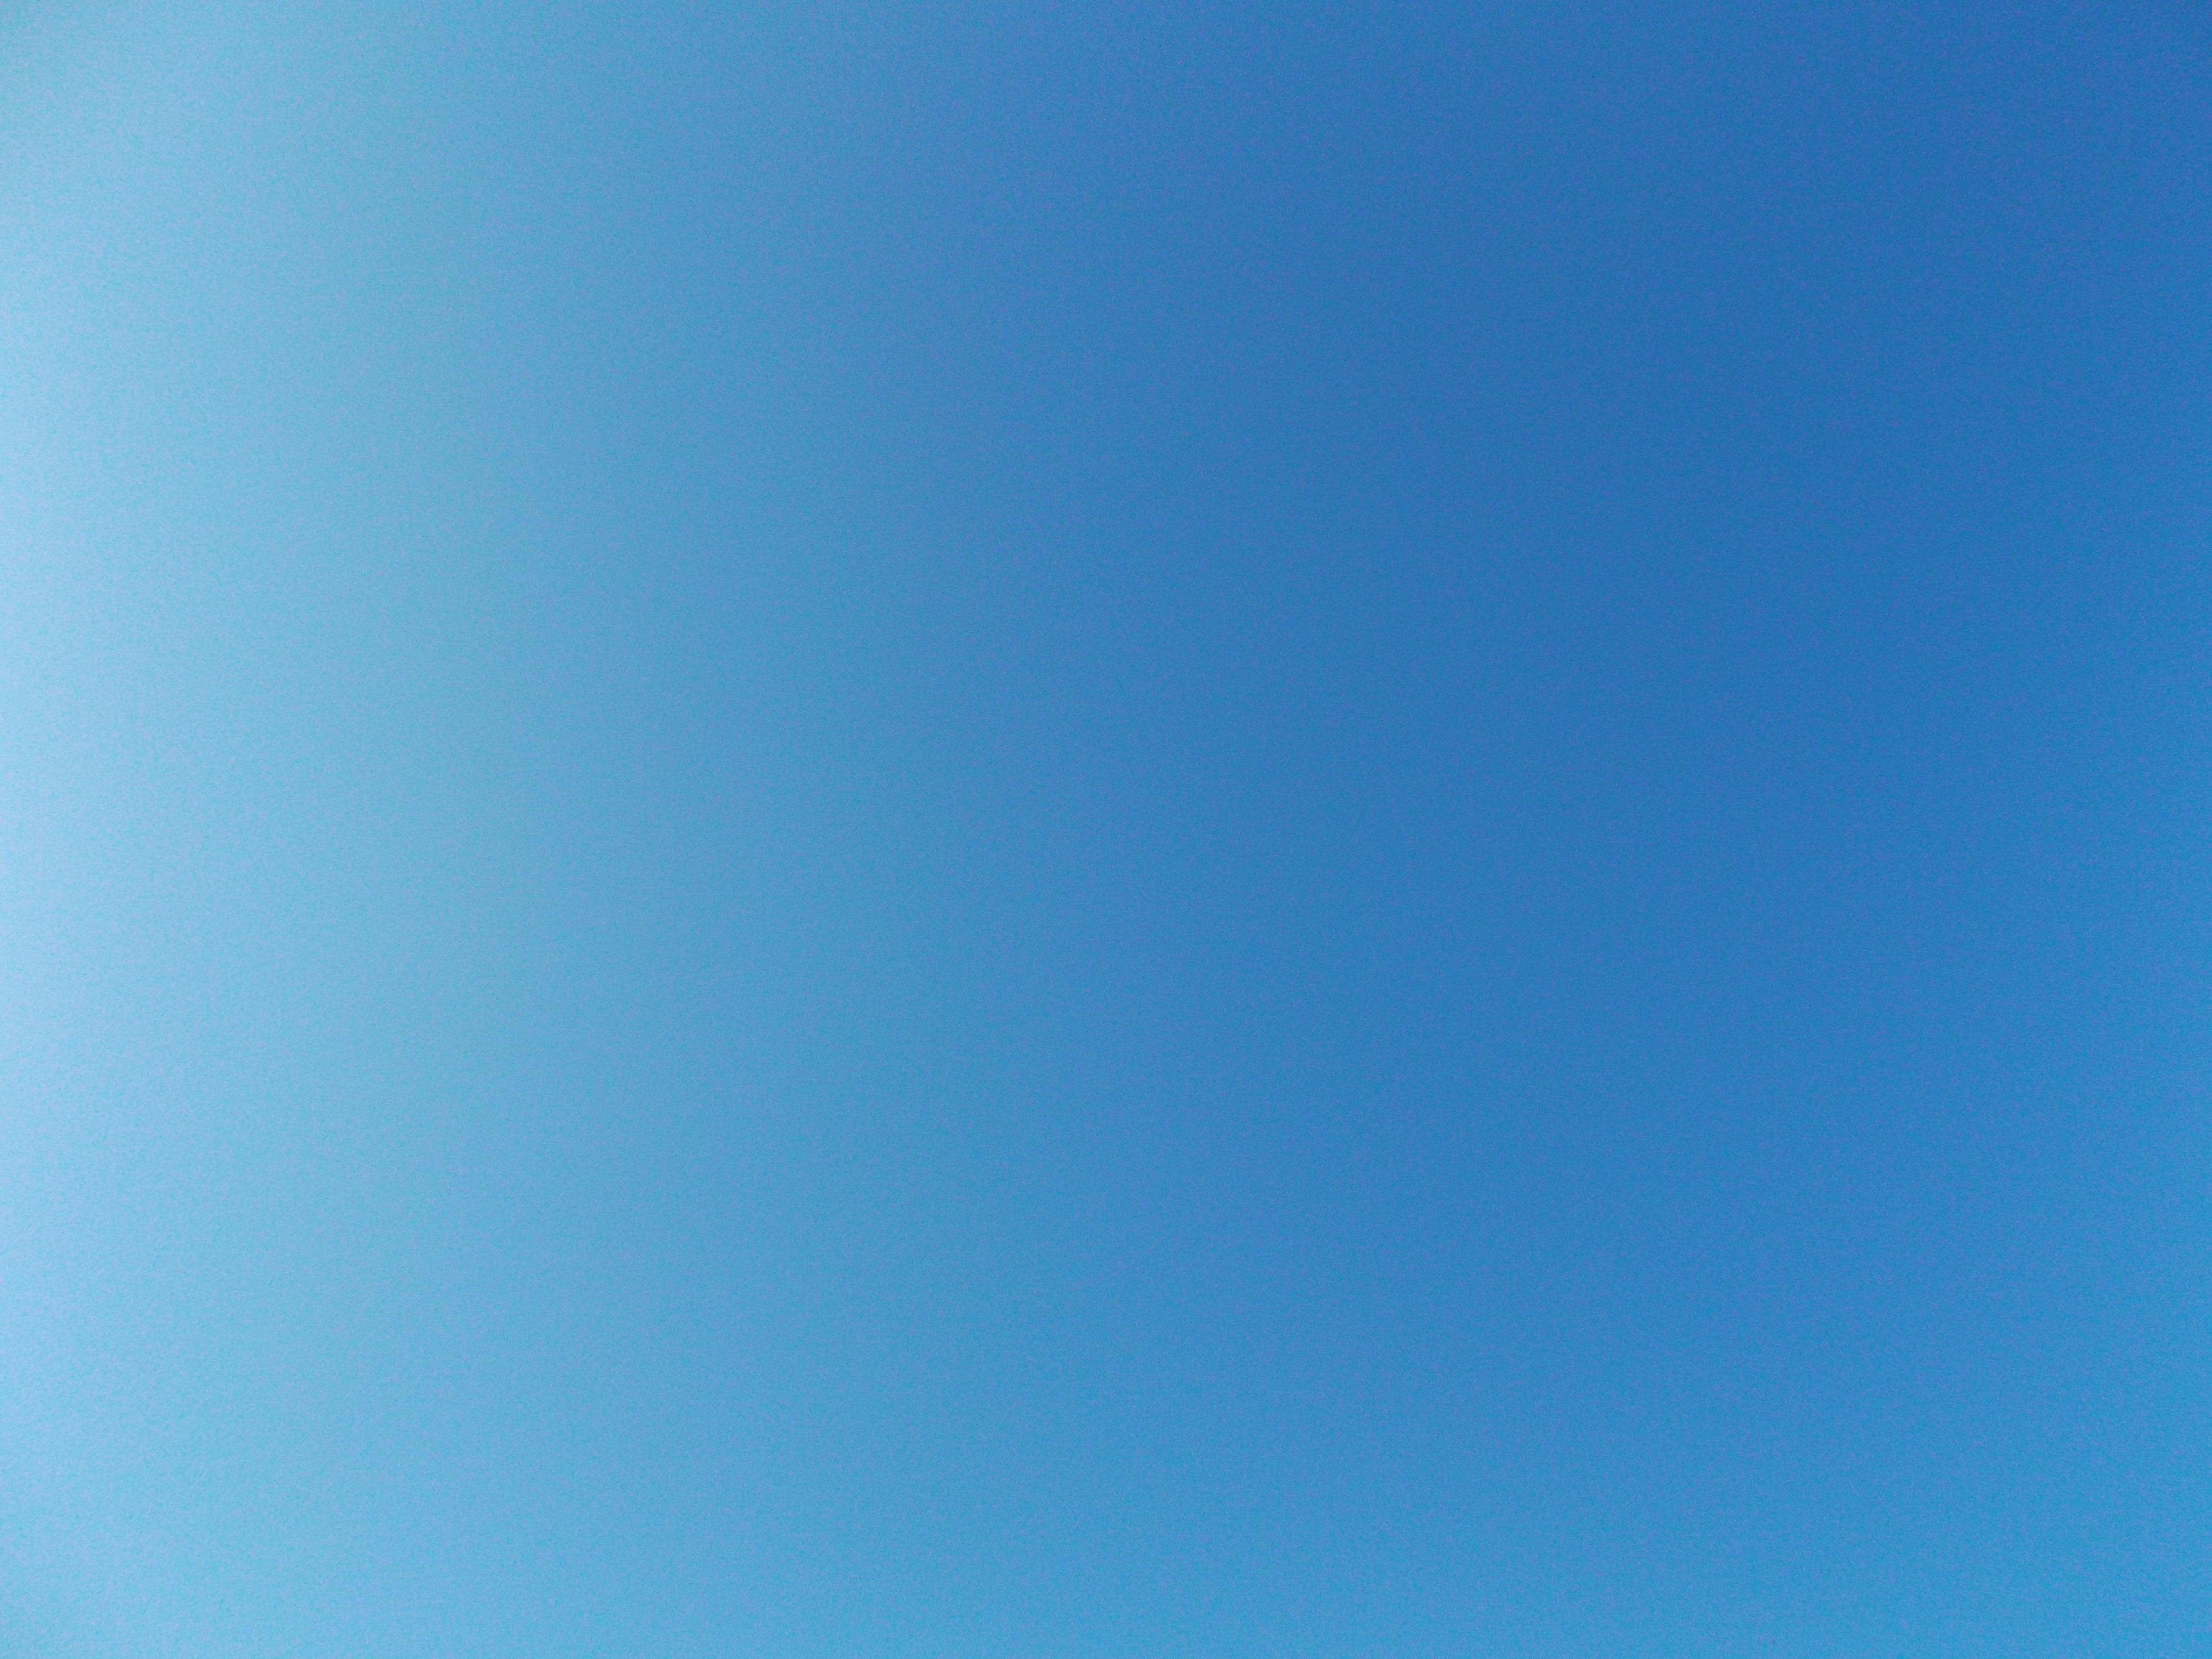 2013-02-18 Longitude -0.371 Latitude 49.182 Altitude 13 Heure 12h30